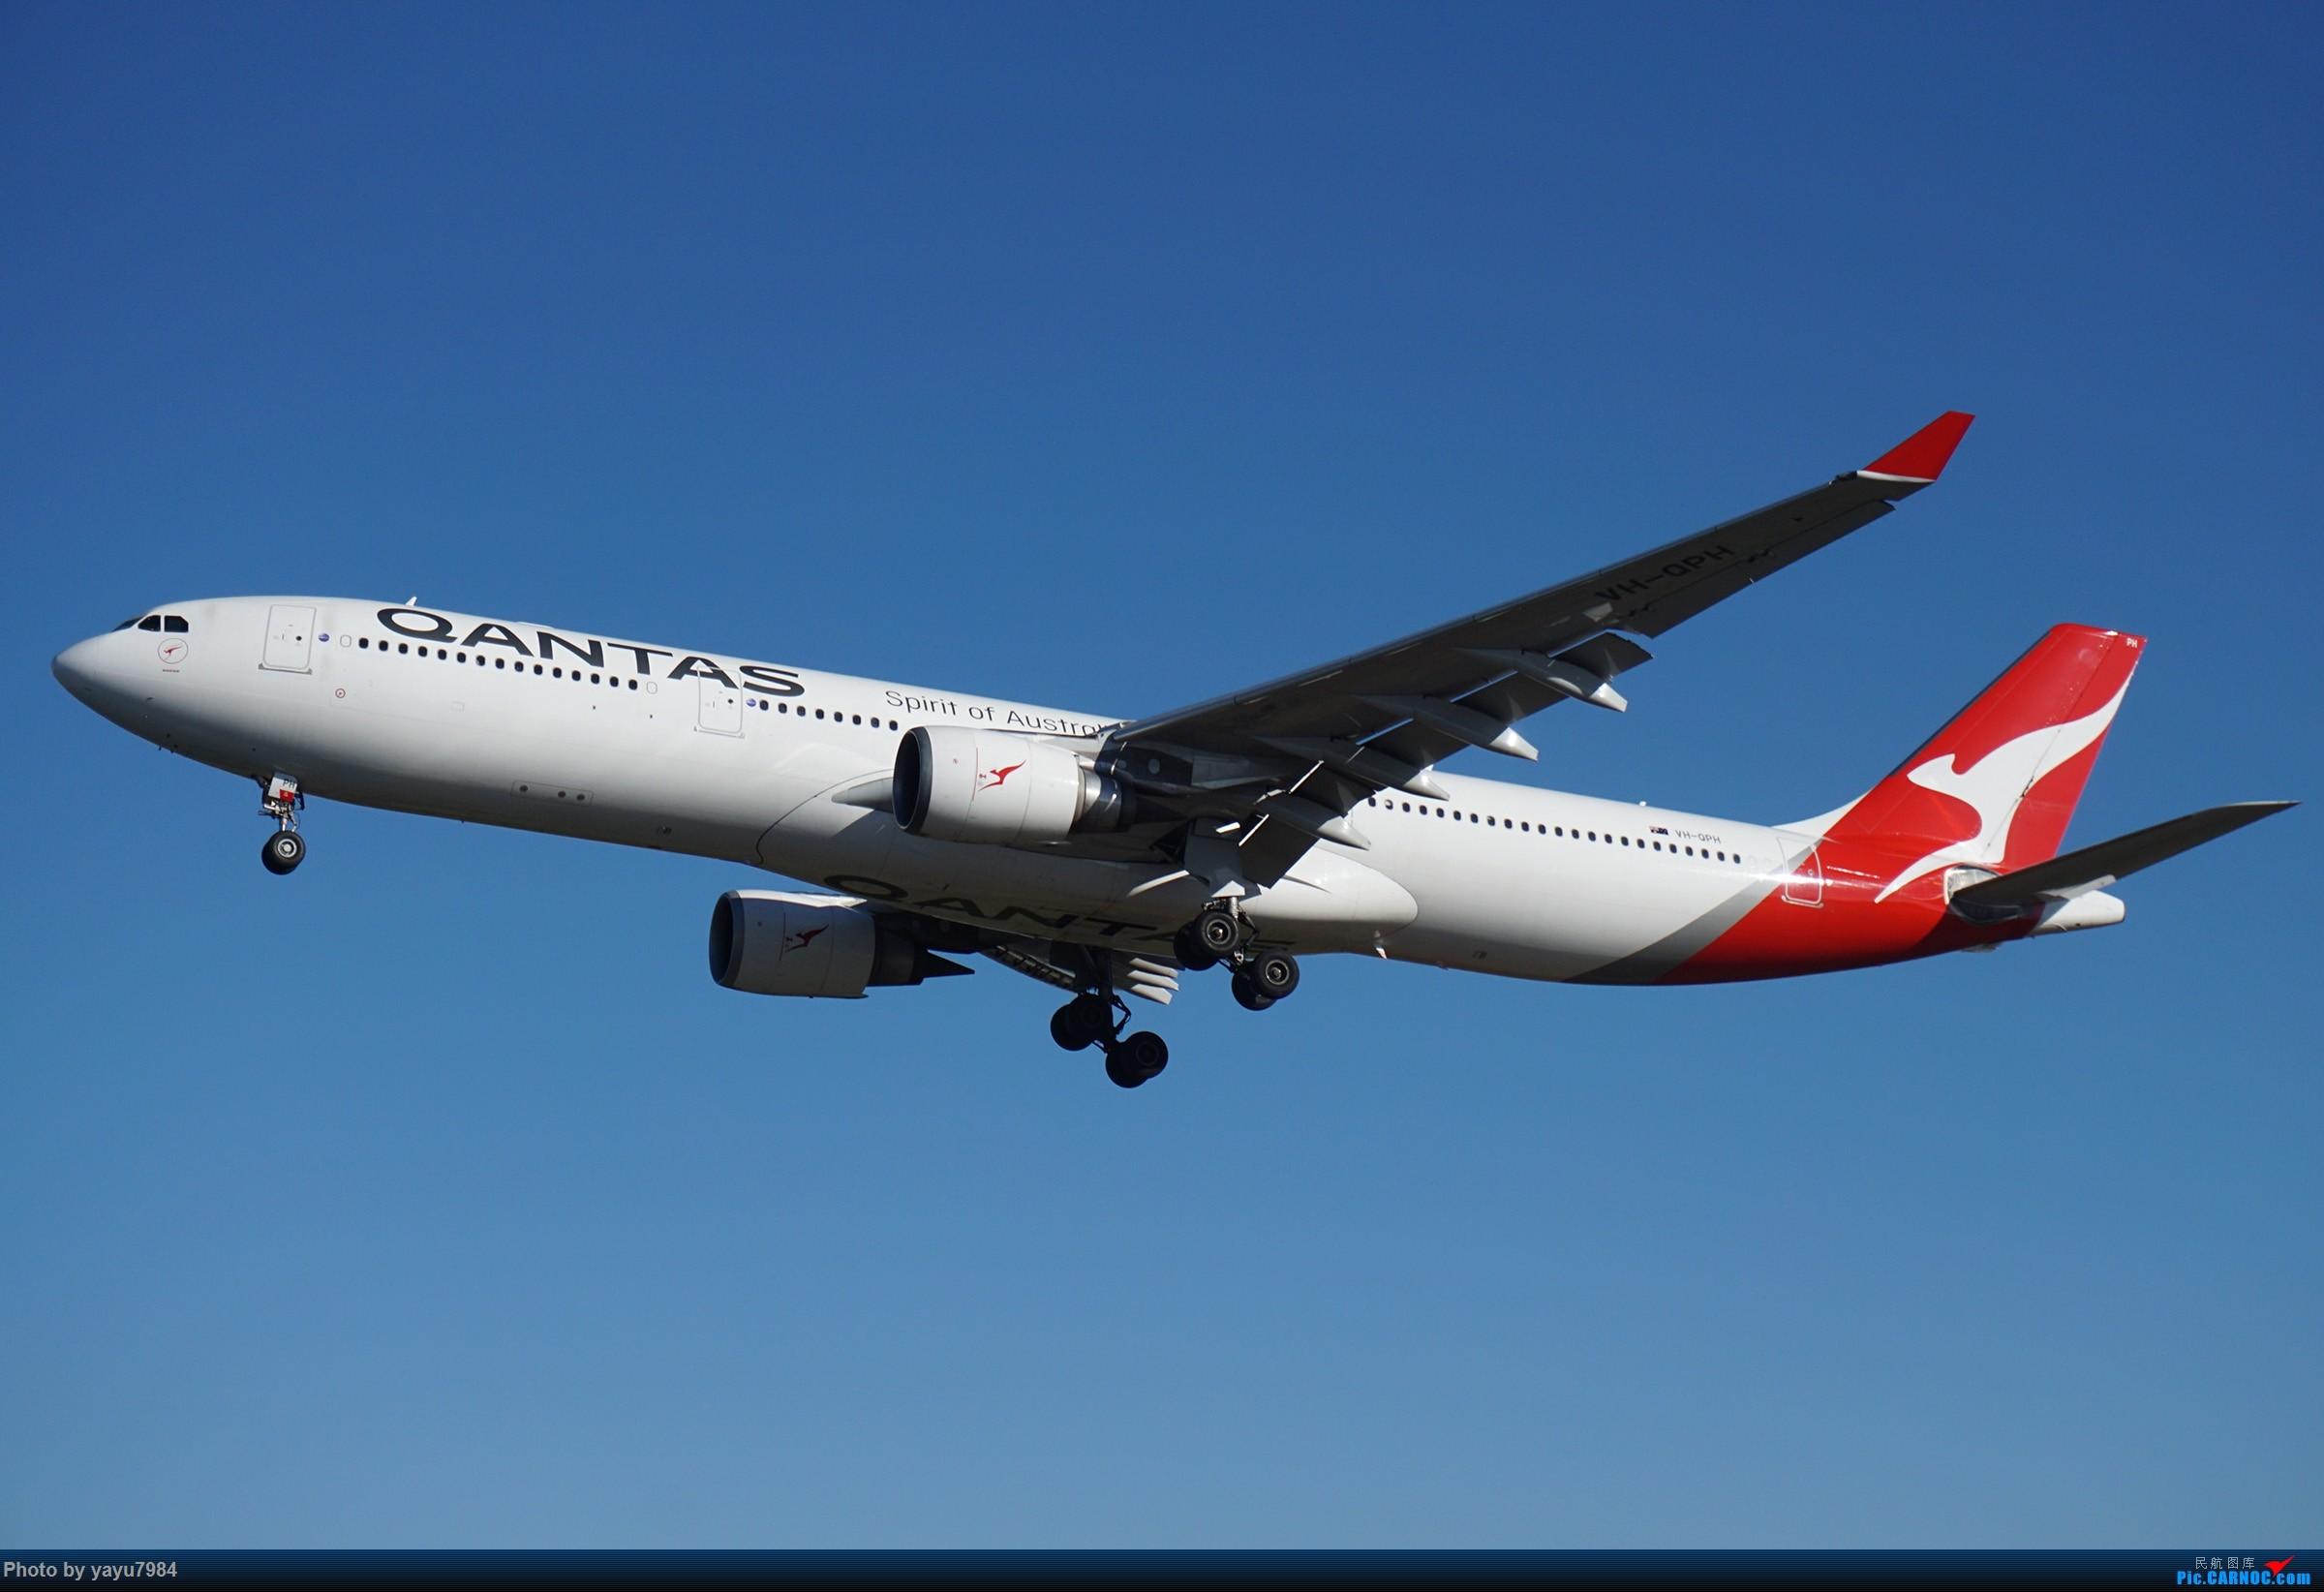 Re:[原创][SYD] 晨悉尼,16R扎堆到达 AIRBUS A330-300 VH-QPH 澳大利亚悉尼金斯福德·史密斯机场